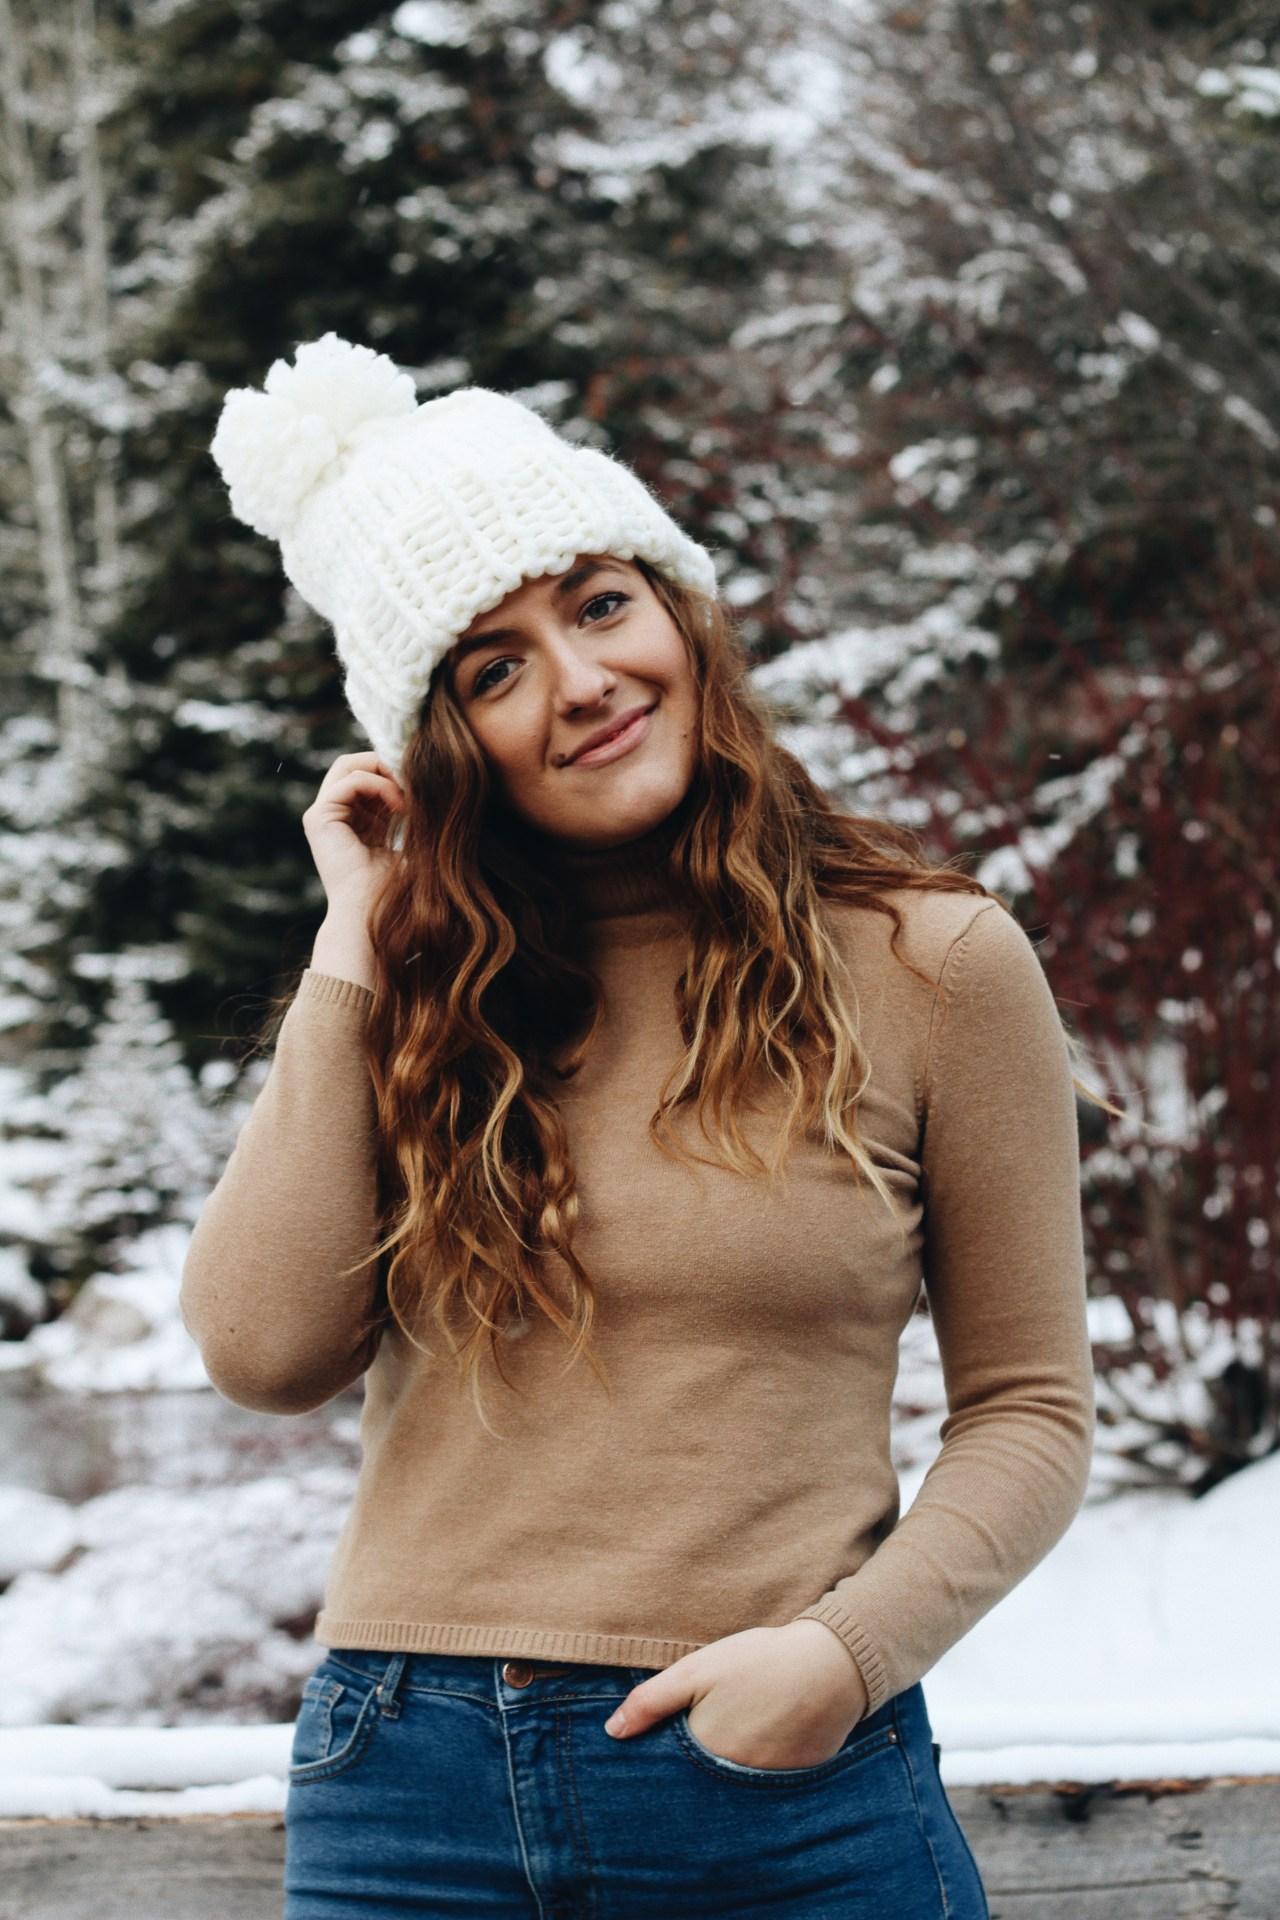 overcome social anxiety winter portrait sundance utah